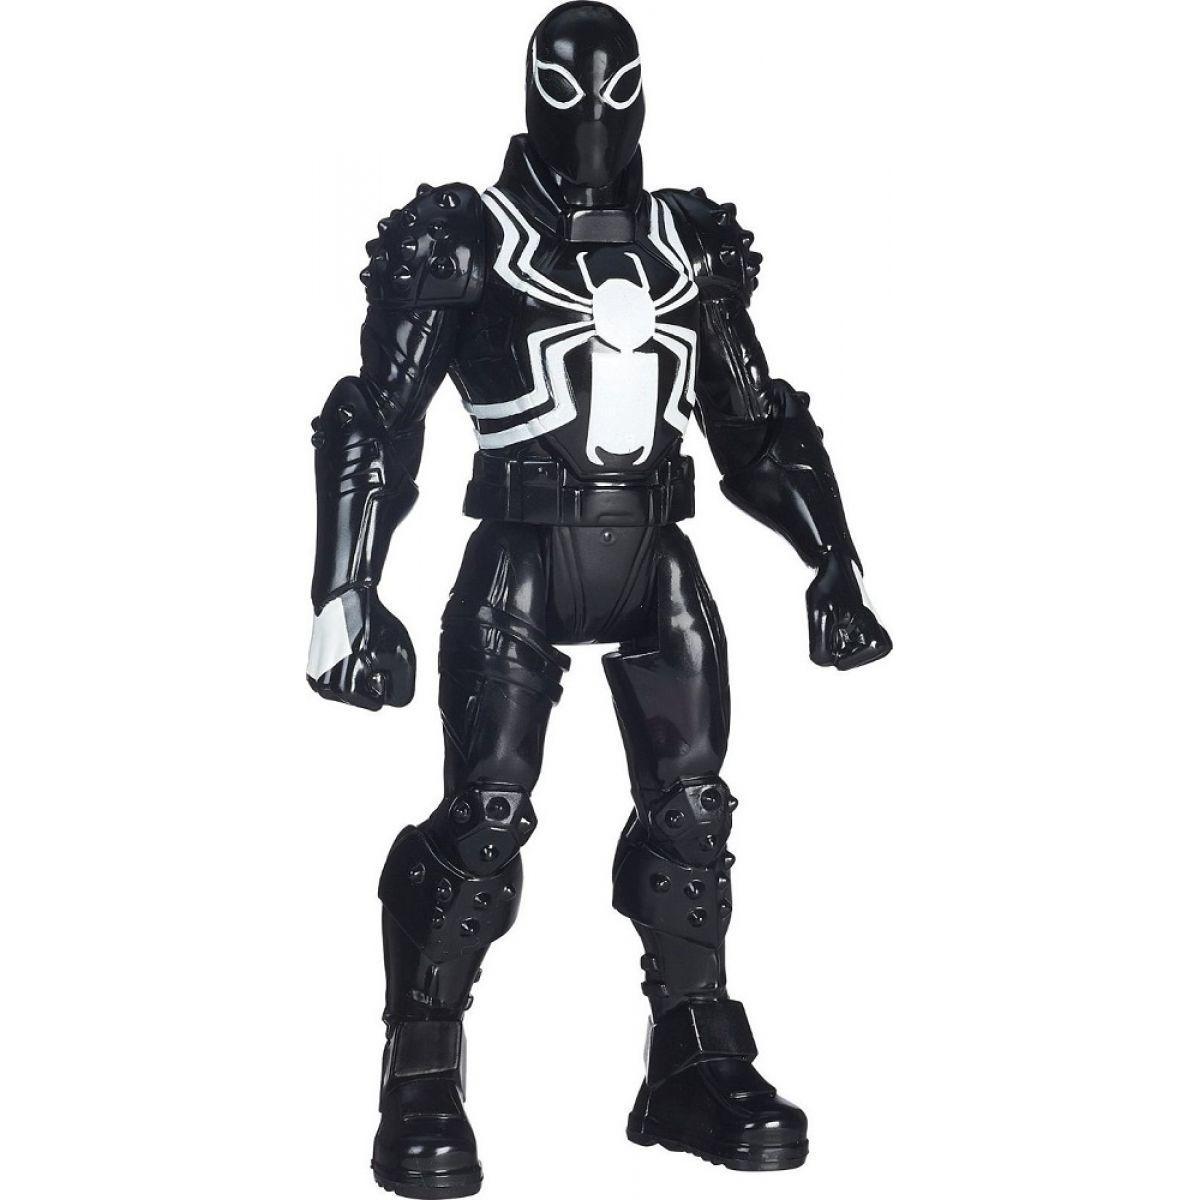 Hasbro Spiderman Akční figurka 14 cm - Agent Venom